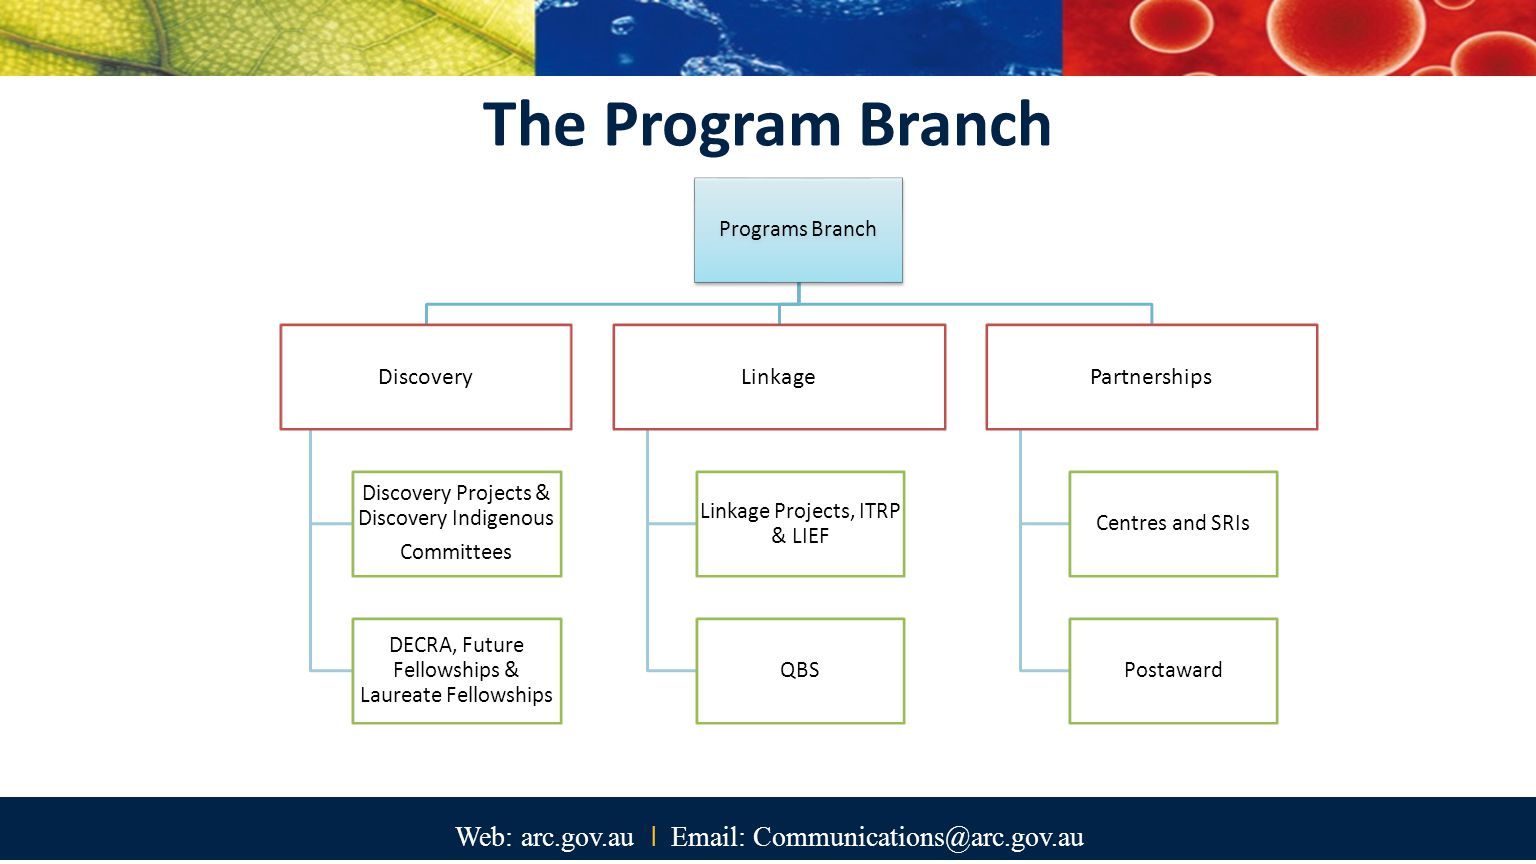 Web: arc.gov.au I Email: Communications@arc.gov.au NCGP Update Commonwealth grants Streamlining NCGP Scheme deliveries Postaward Scheme calendar Challenges and opportunities for 2015